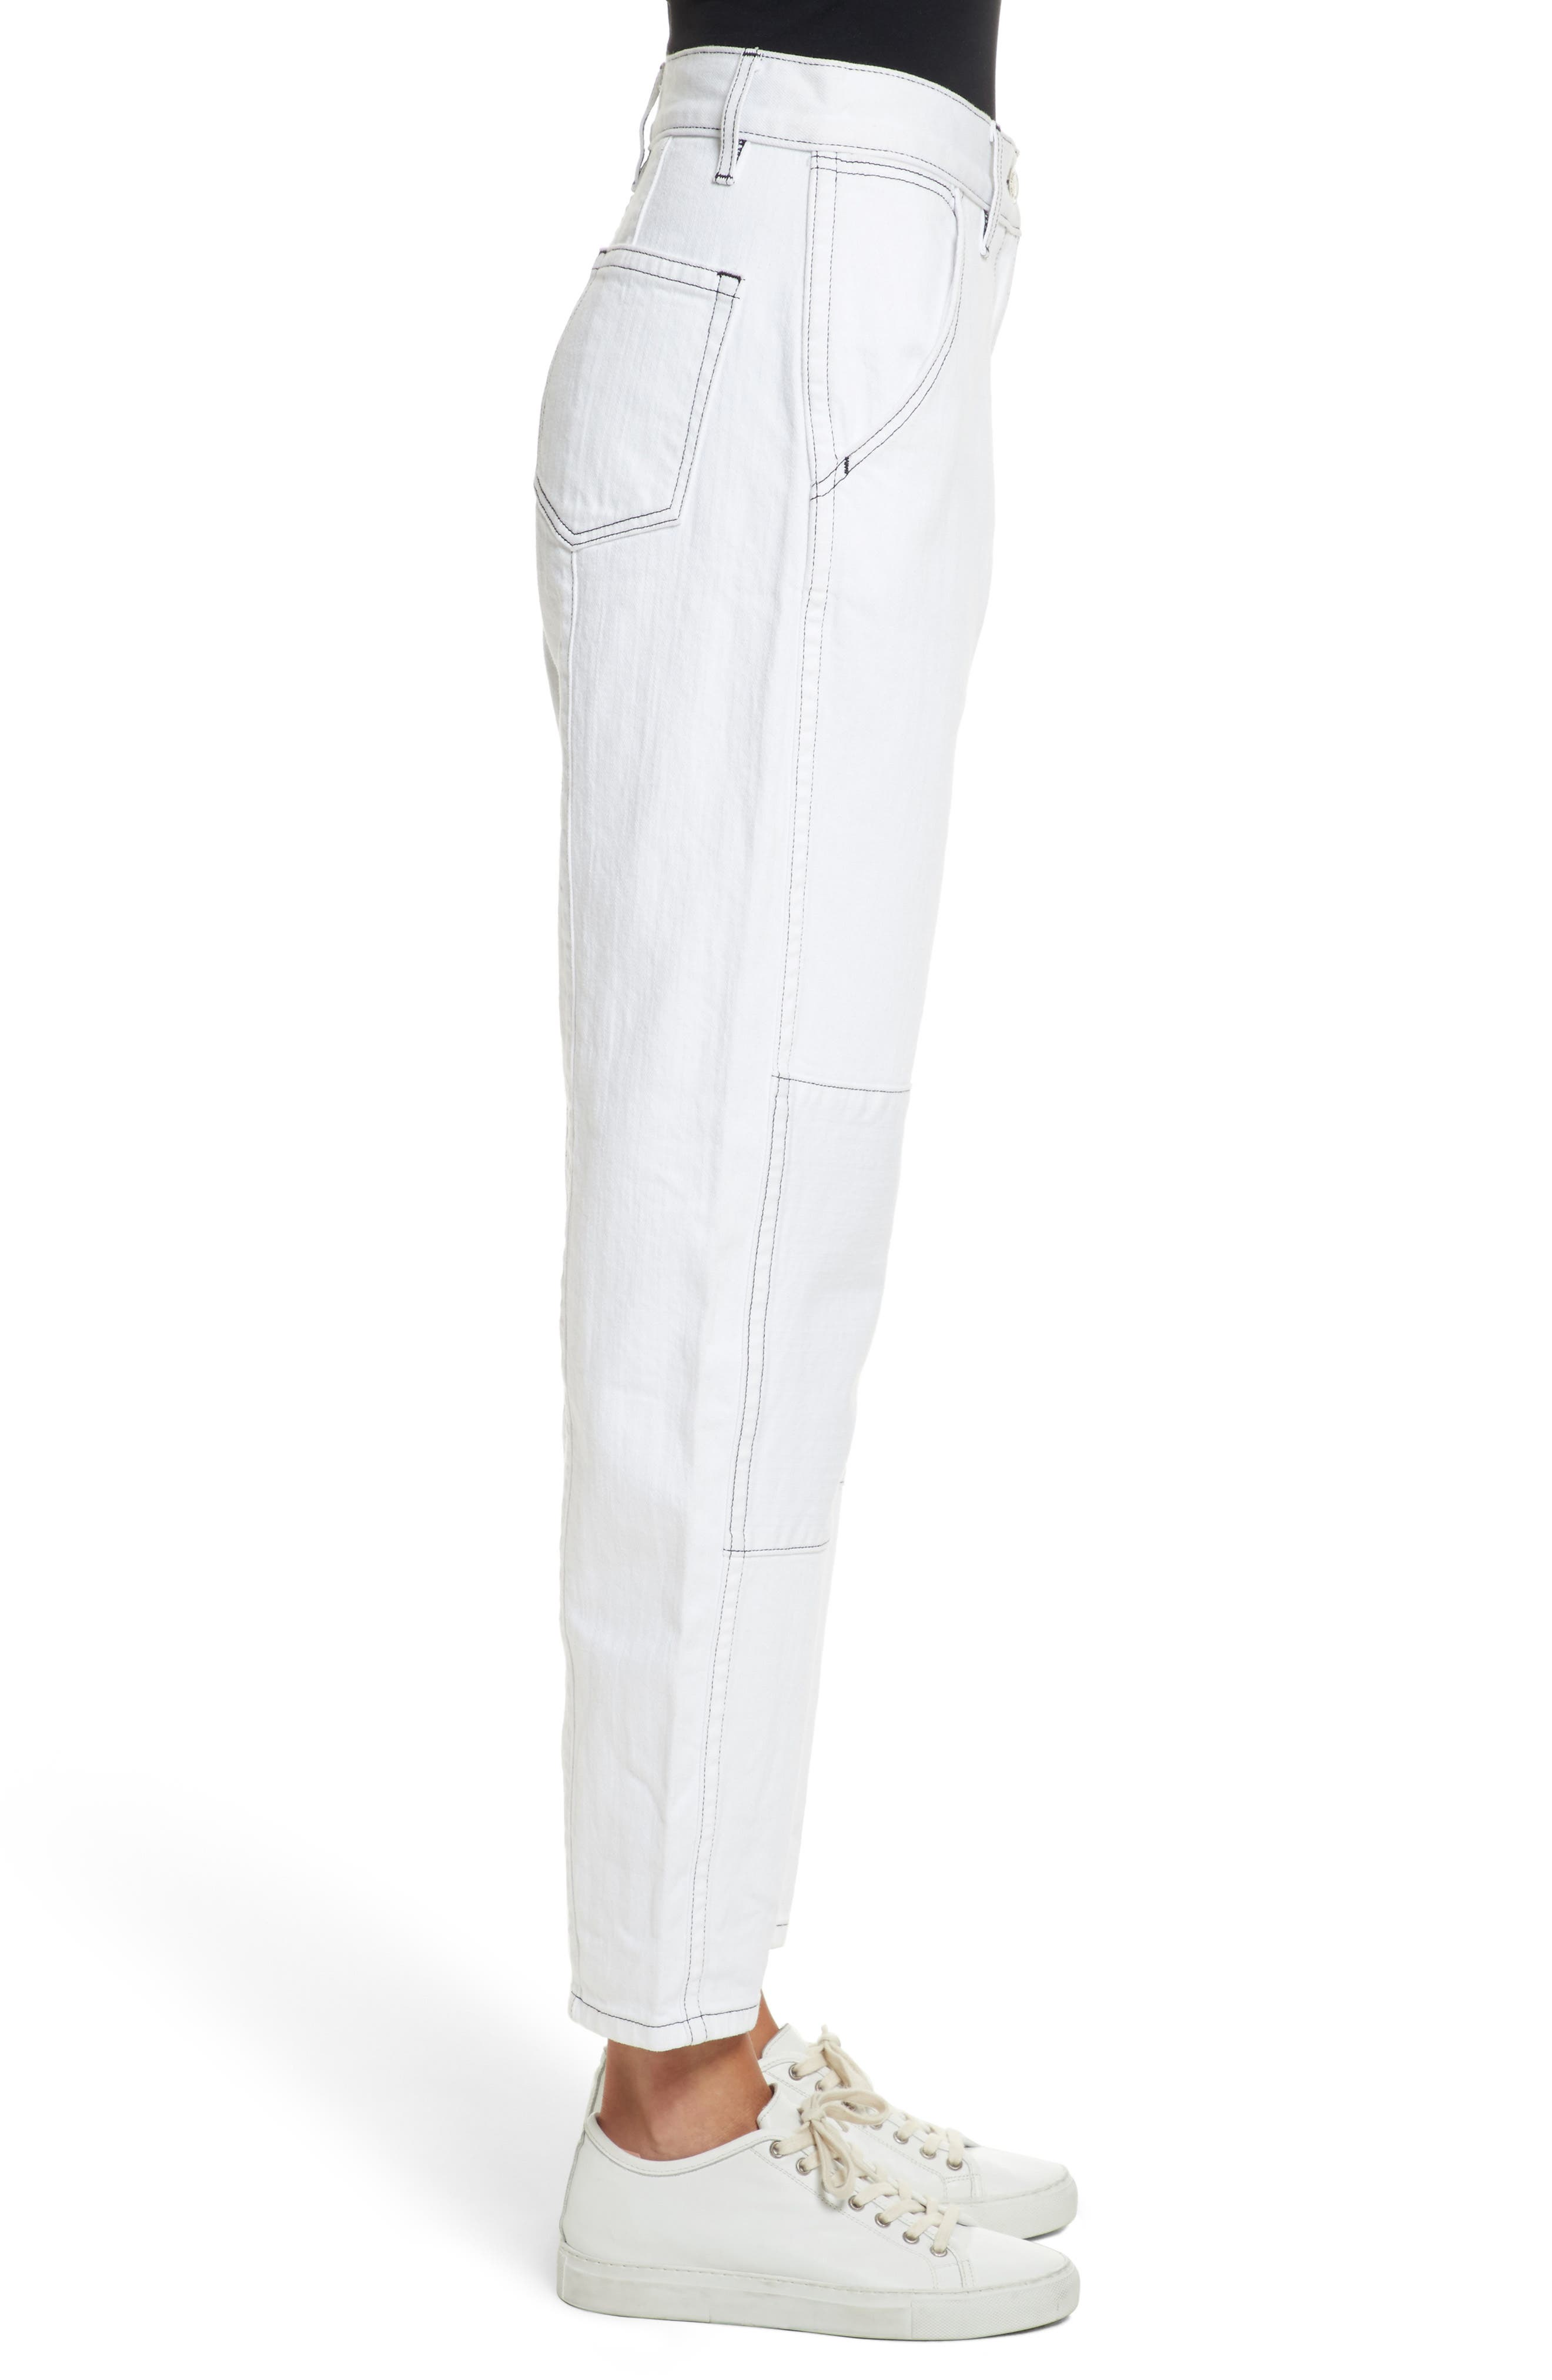 Pamela Ankle Jeans,                             Alternate thumbnail 3, color,